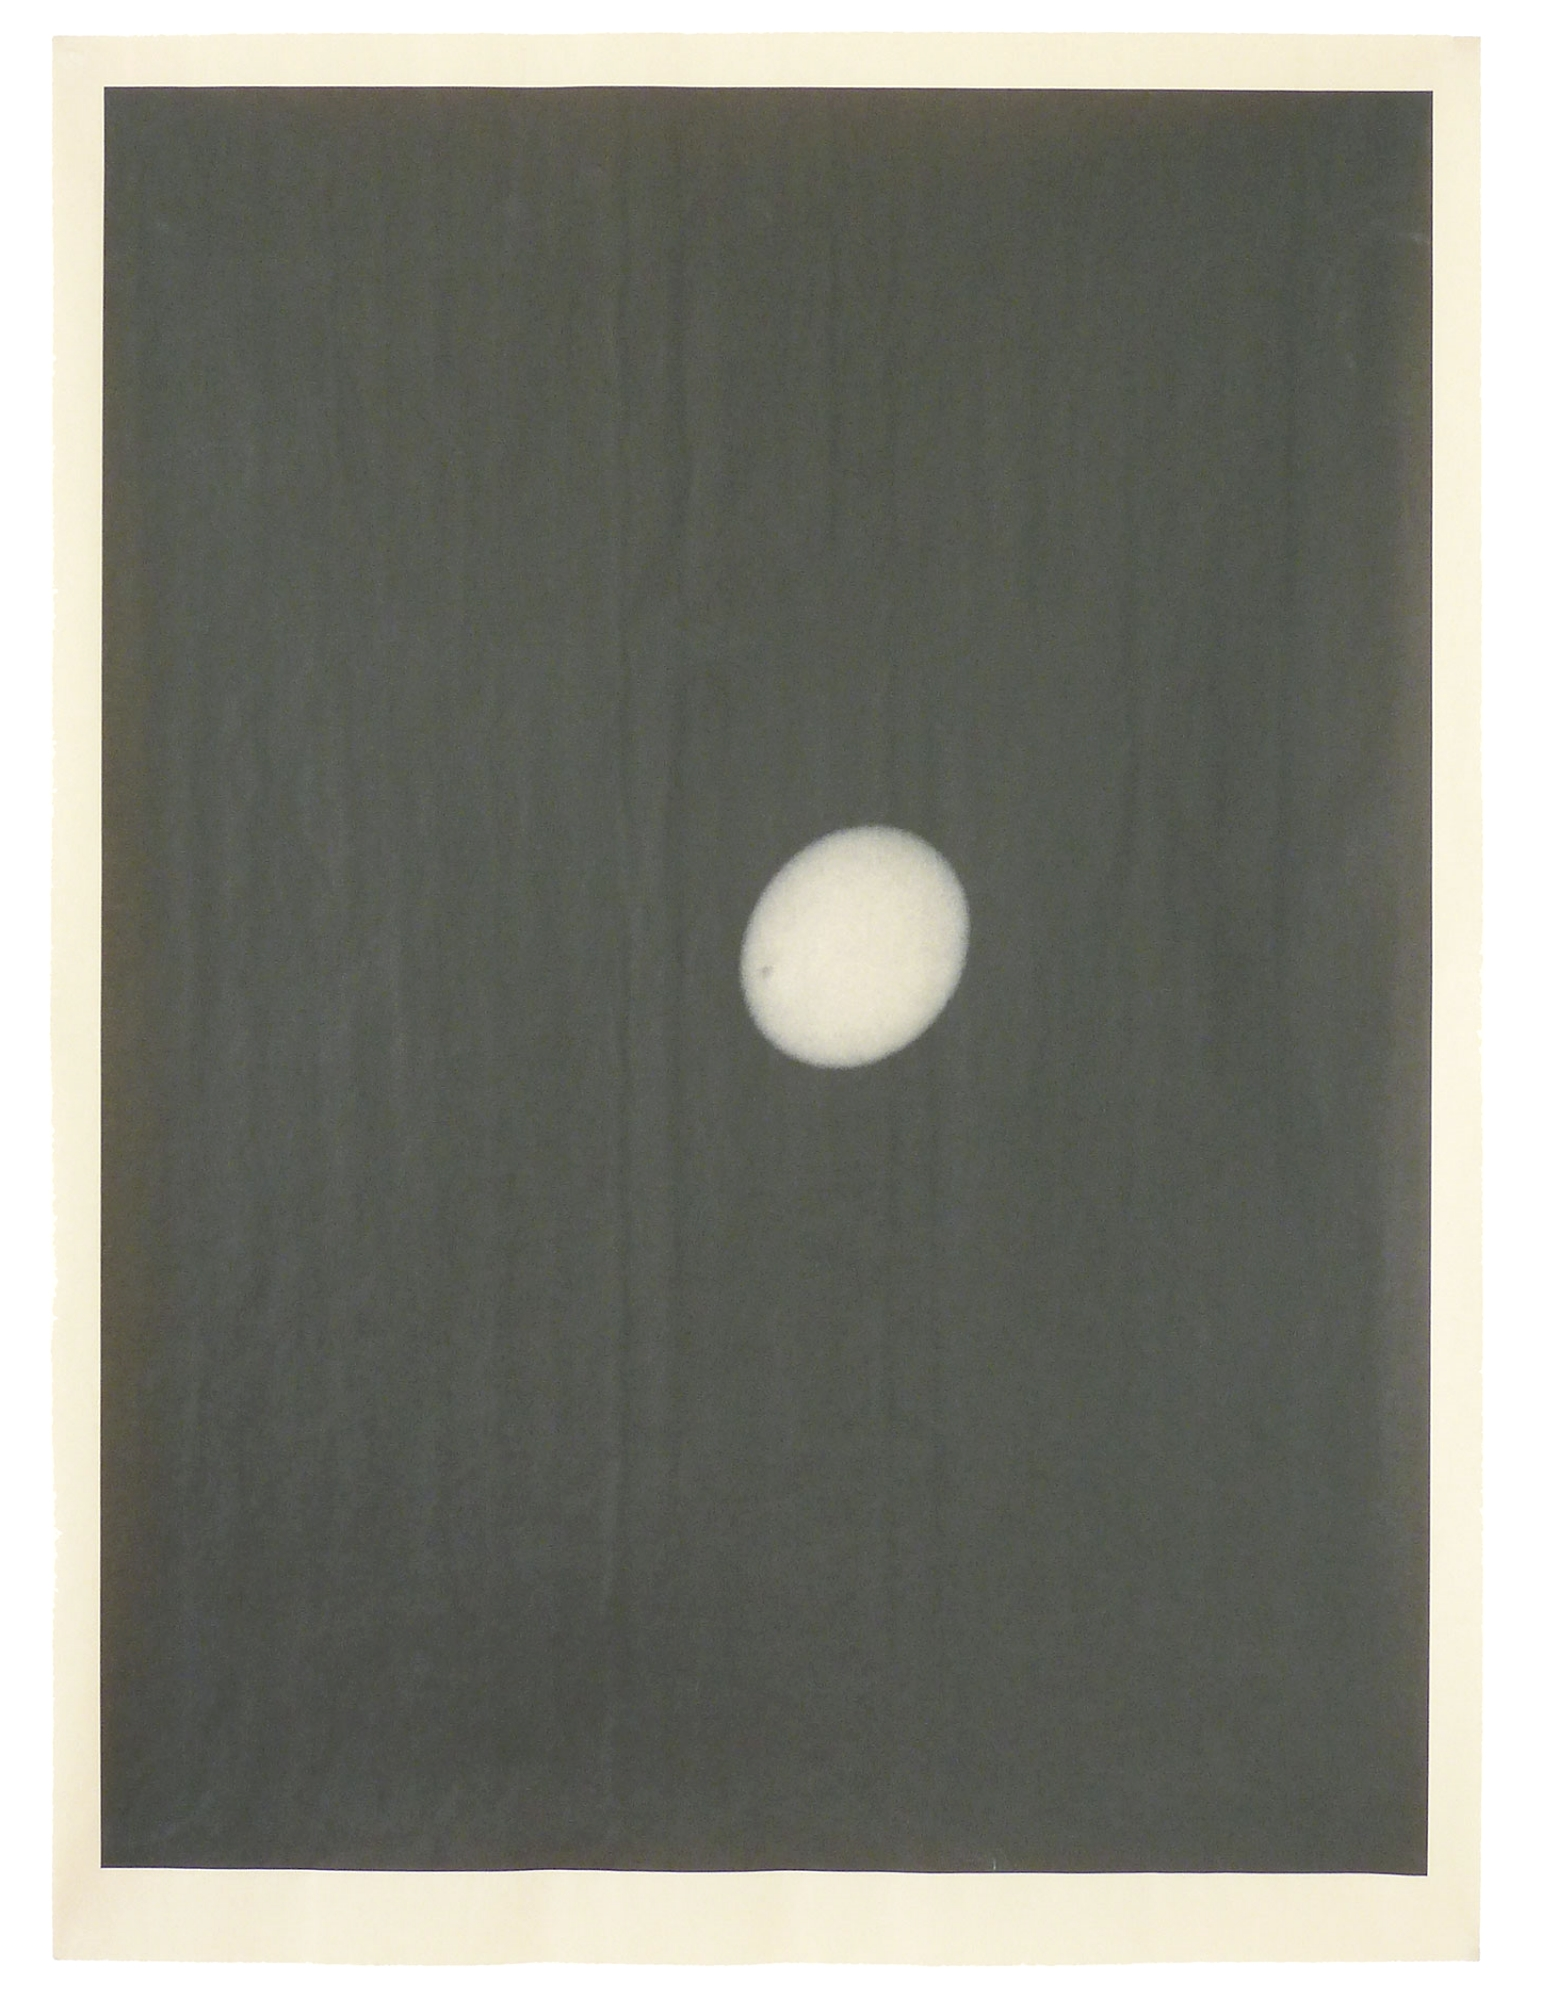 LA_30154 , unique pigment print on newsprint, 18 x 24 inches, 2014